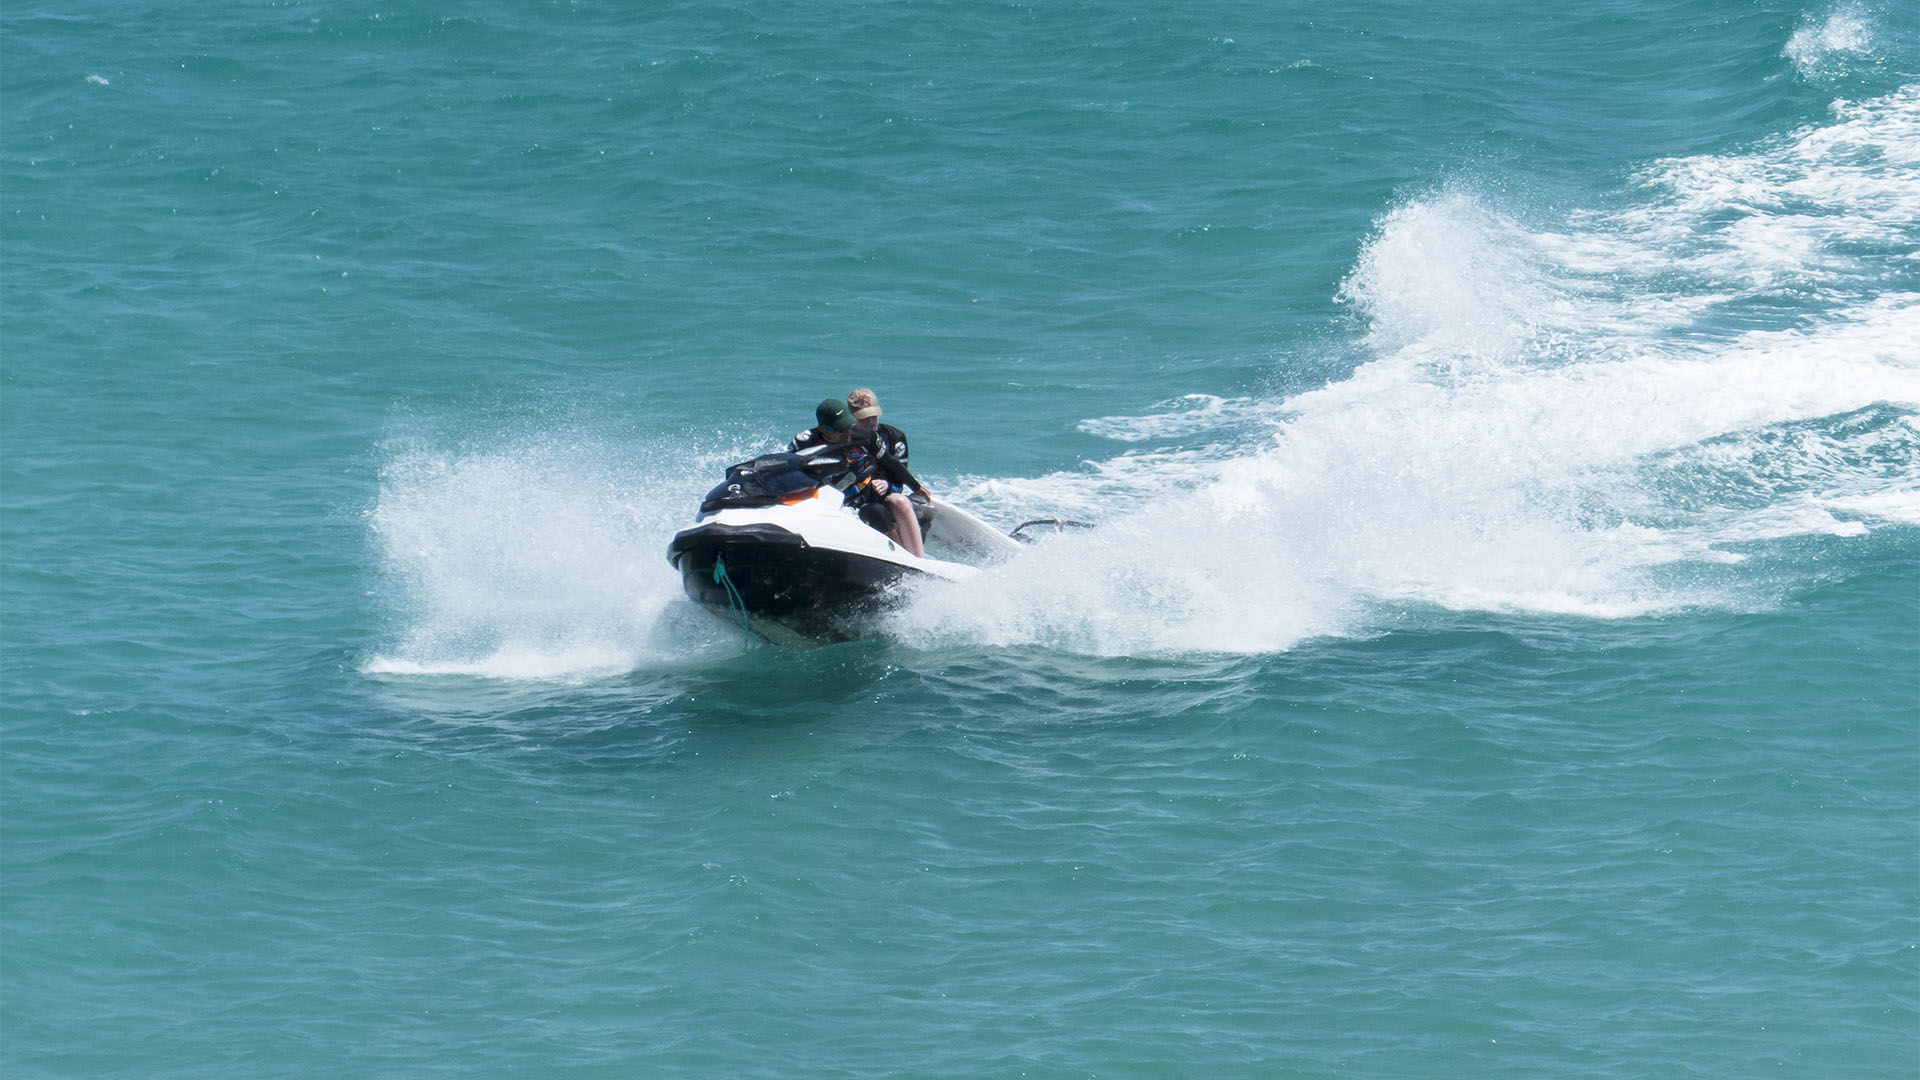 Funsport, Jetski, Jetskisafaris, Parasailing und mehr auf Fuerteventura.